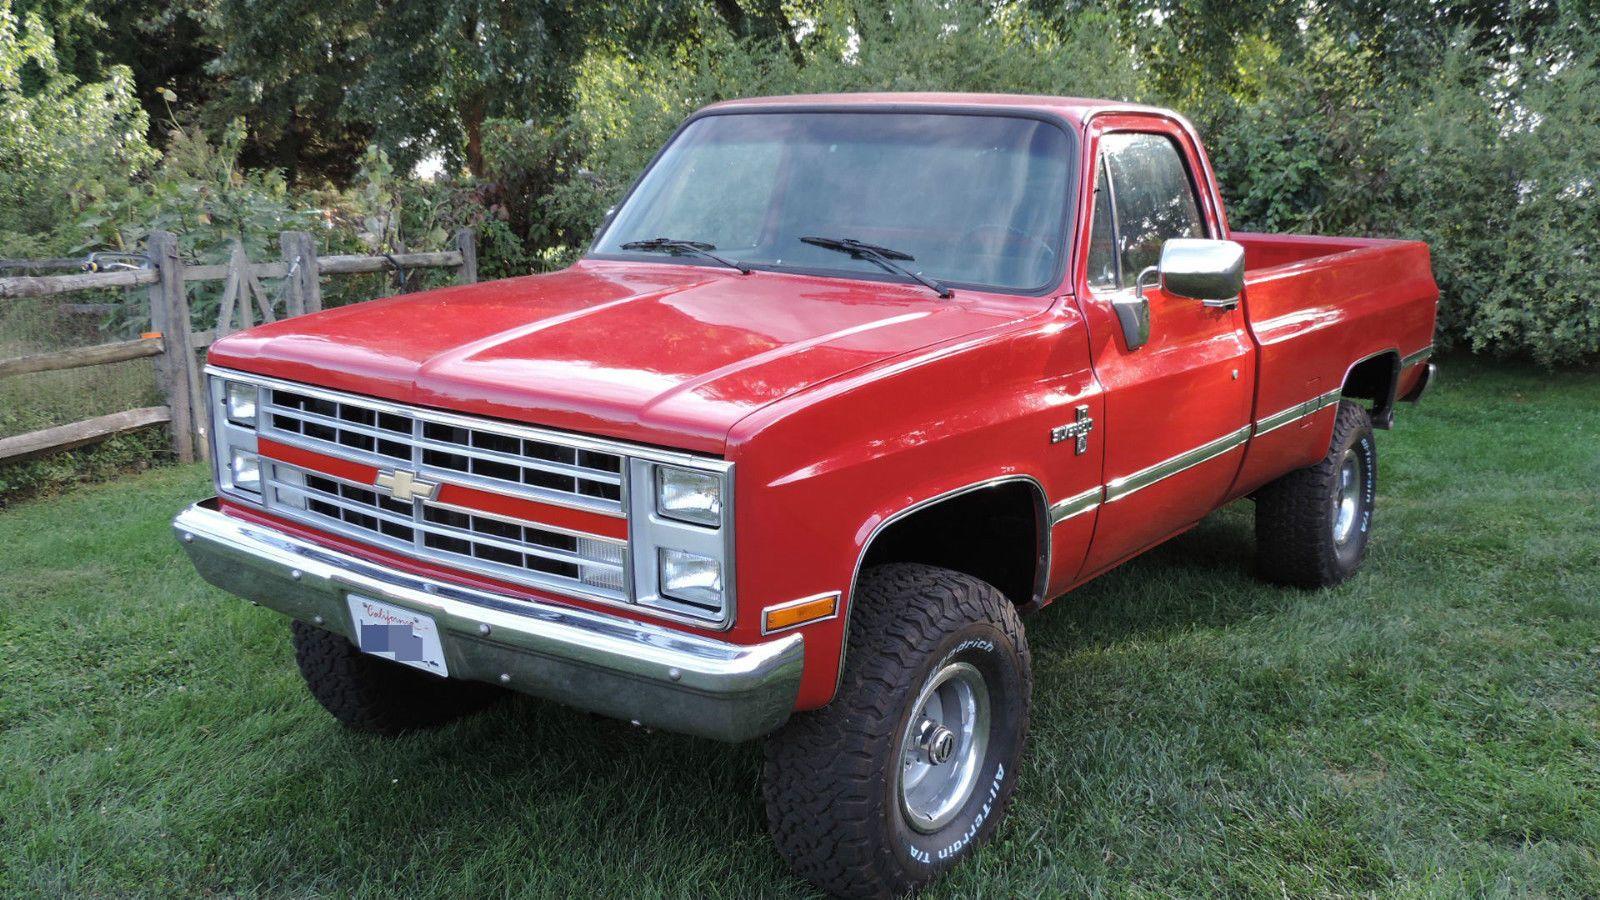 Silverado chevy 1987 silverado : 1987 Chevrolet K10 4×4 Pickup truck for sale